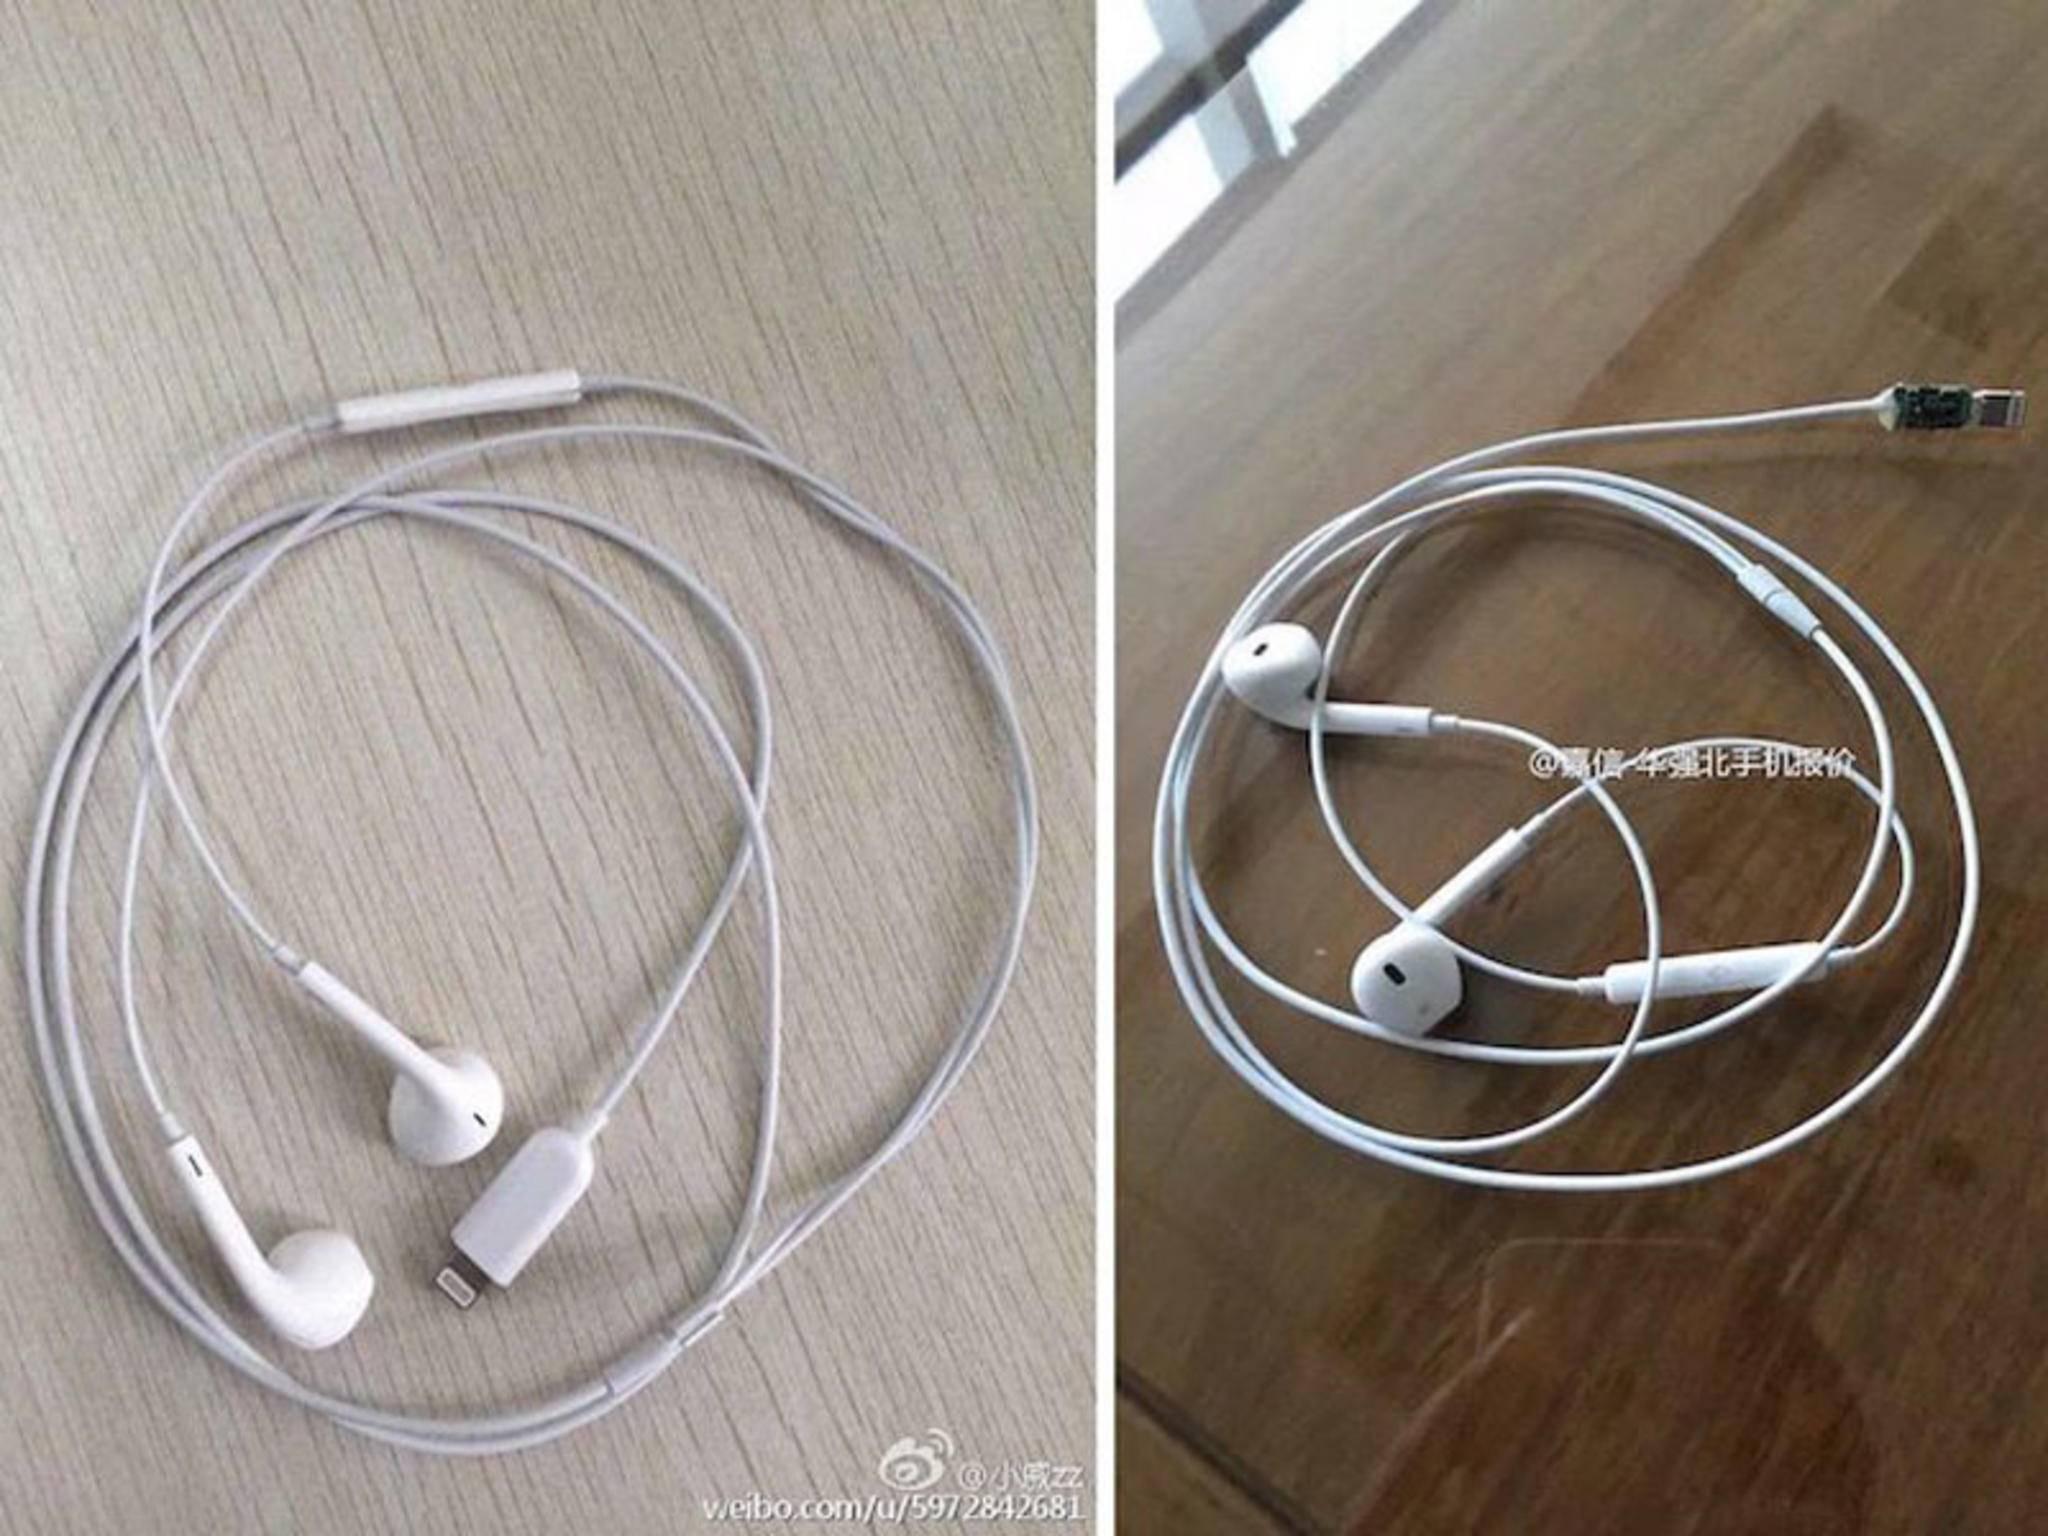 Legt Apple dem iPhone 7 wirklich solche Lightning EarPods bei?